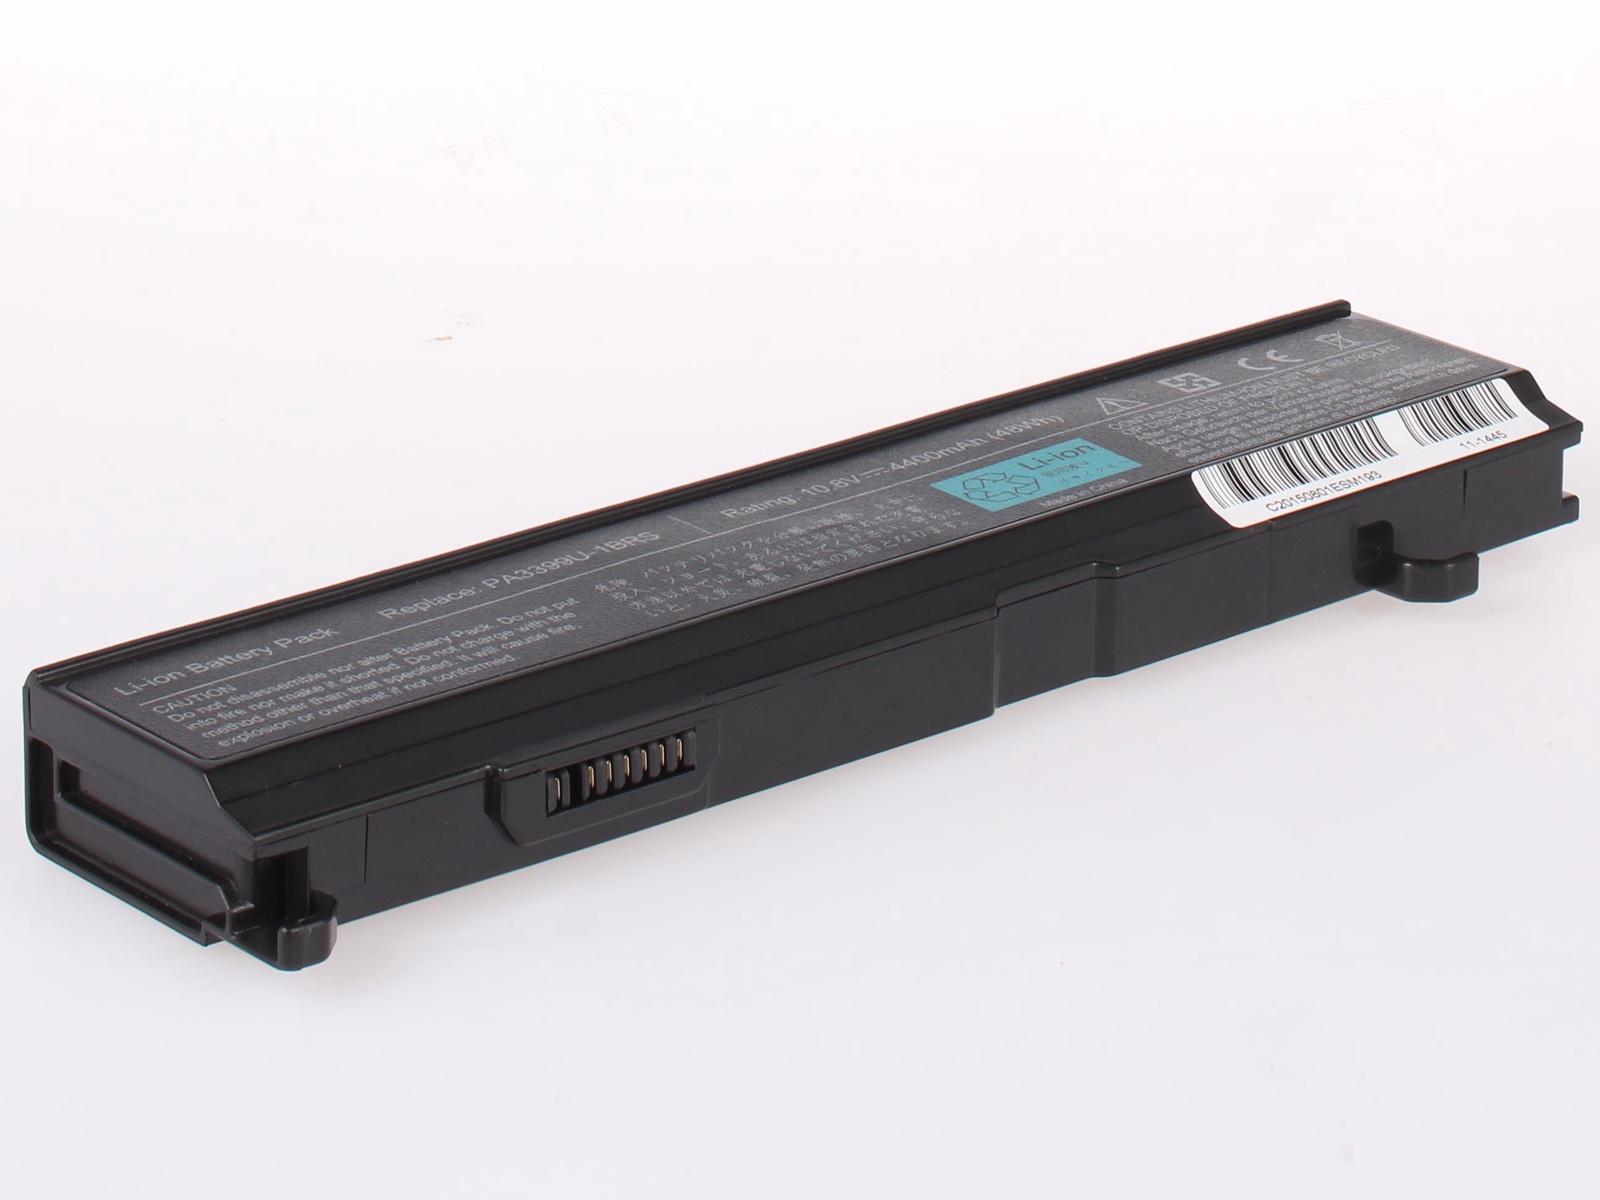 Аккумулятор для ноутбука AnyBatt для ToshiBa Equium A100-338, Satellite A120, Satellite M105-S3064, Satellite M105-S3074, Satellite M110-ST1161, Satellite M45-S269, Satellite M45-S2692, Satellite M55-S135, Tecra S2 цена